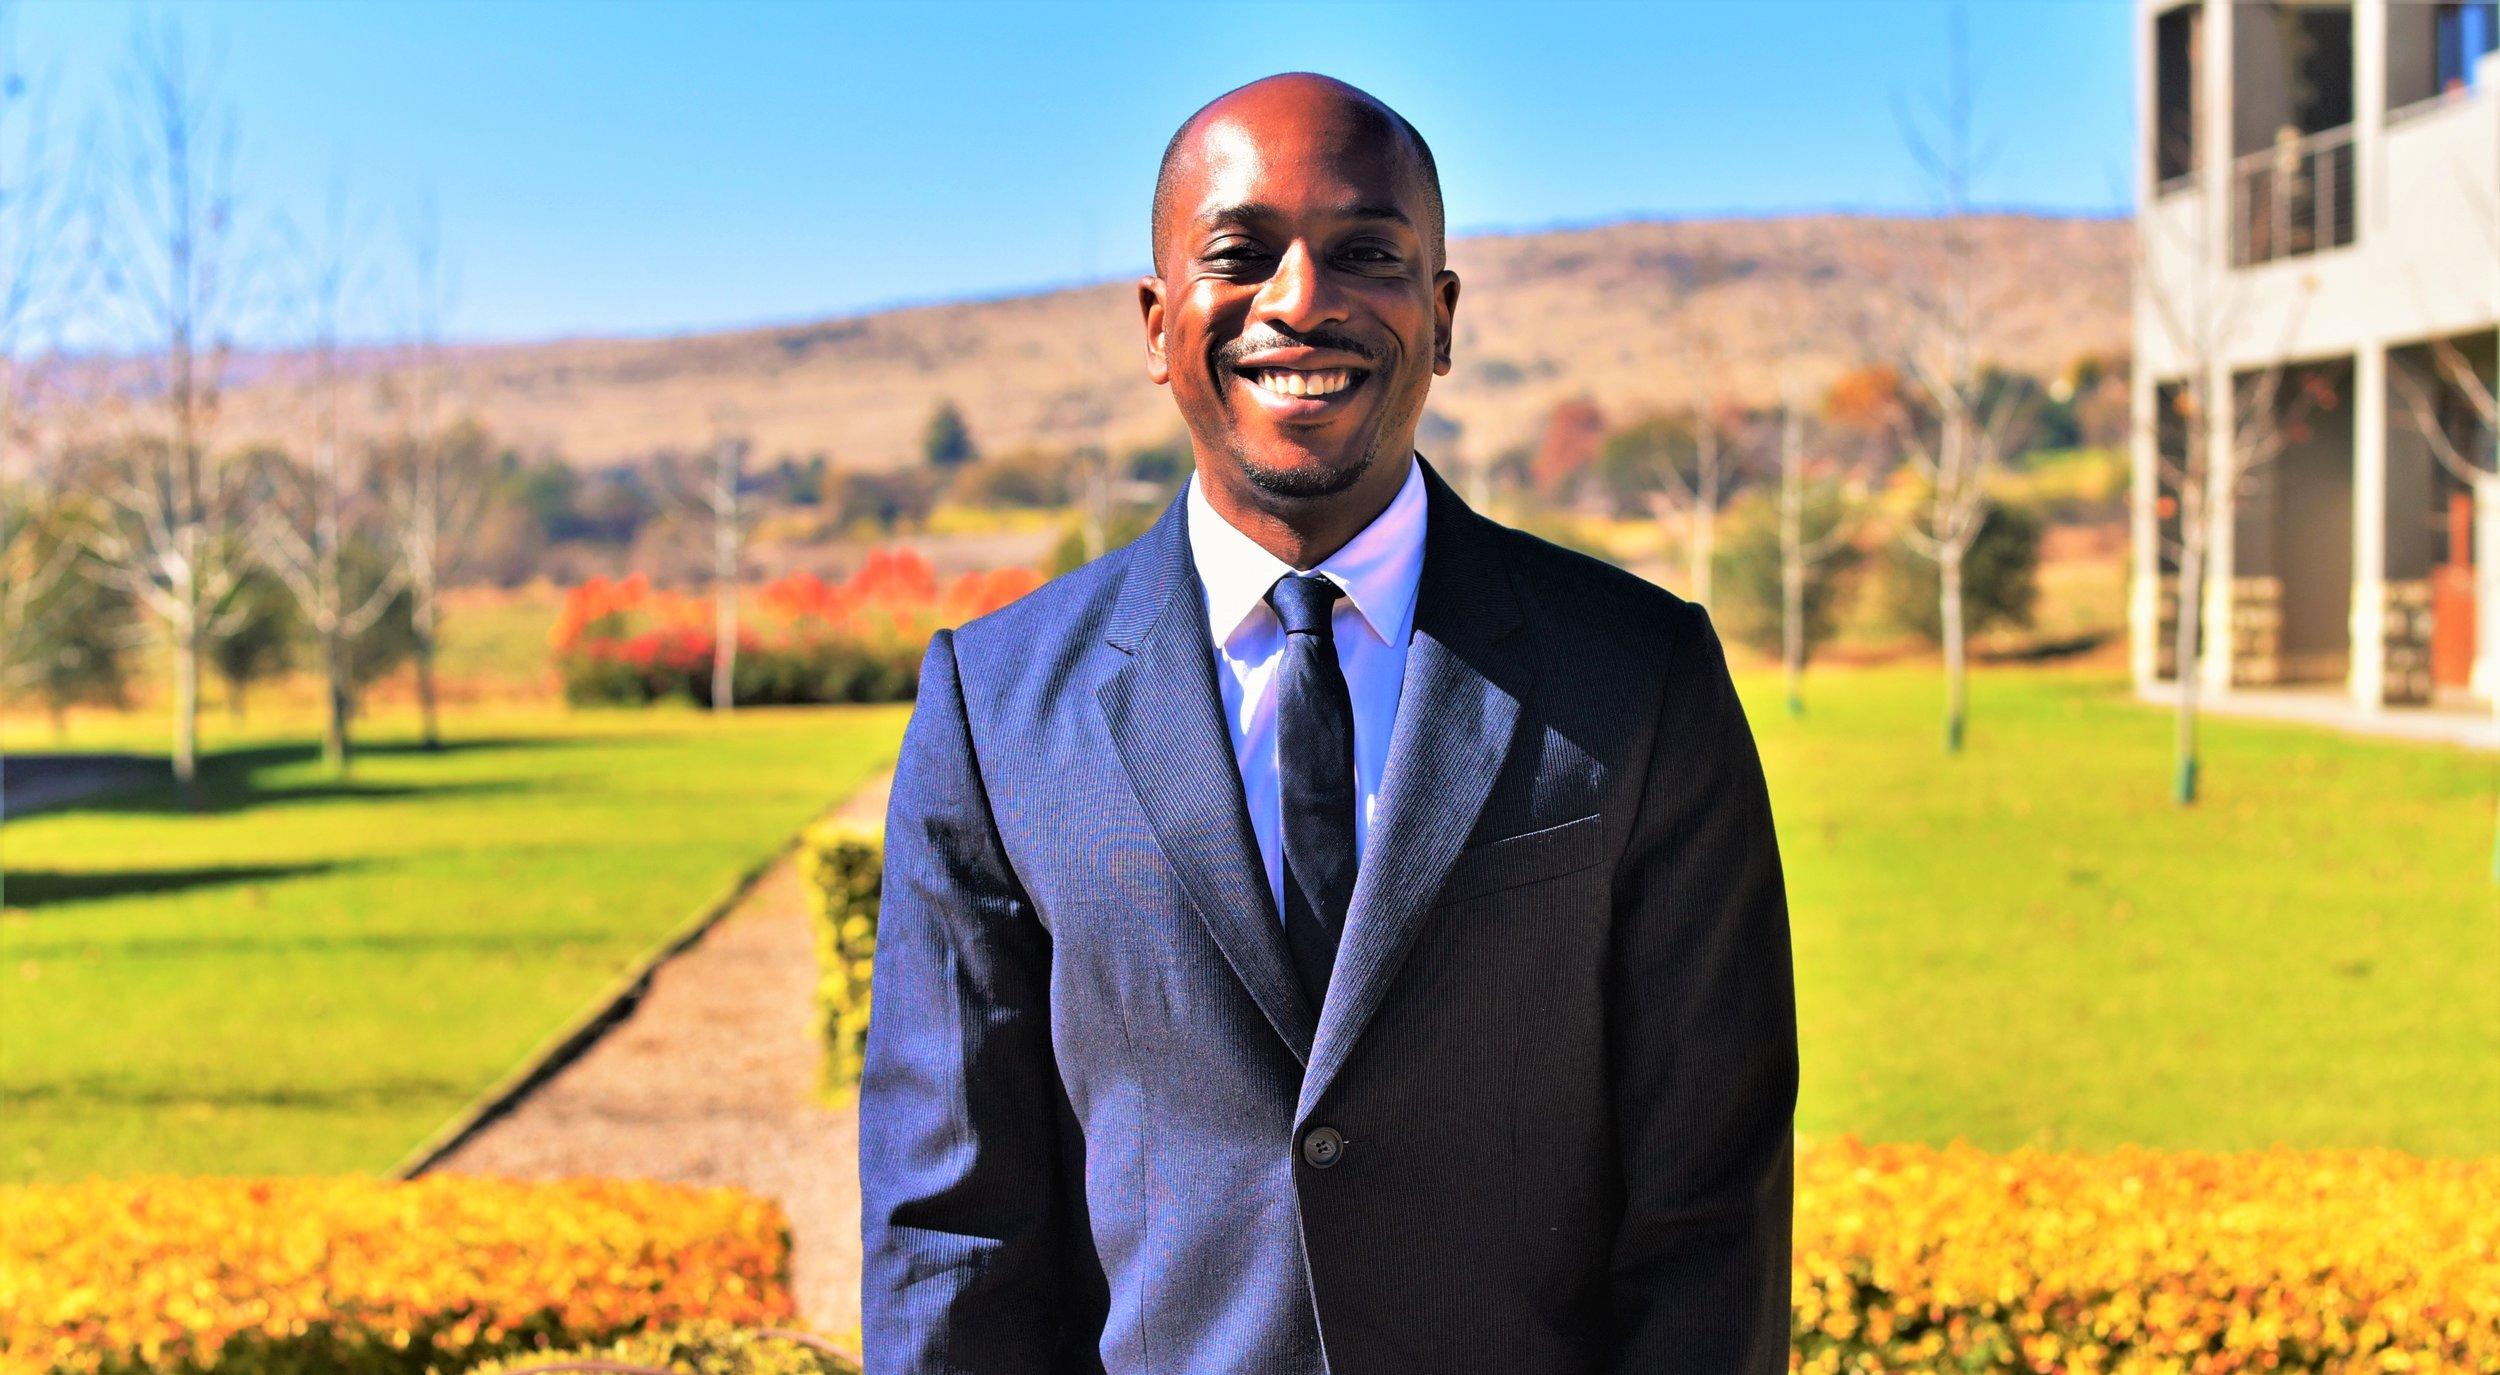 Daryl Hannah | Senior Director of Narrative Strategy